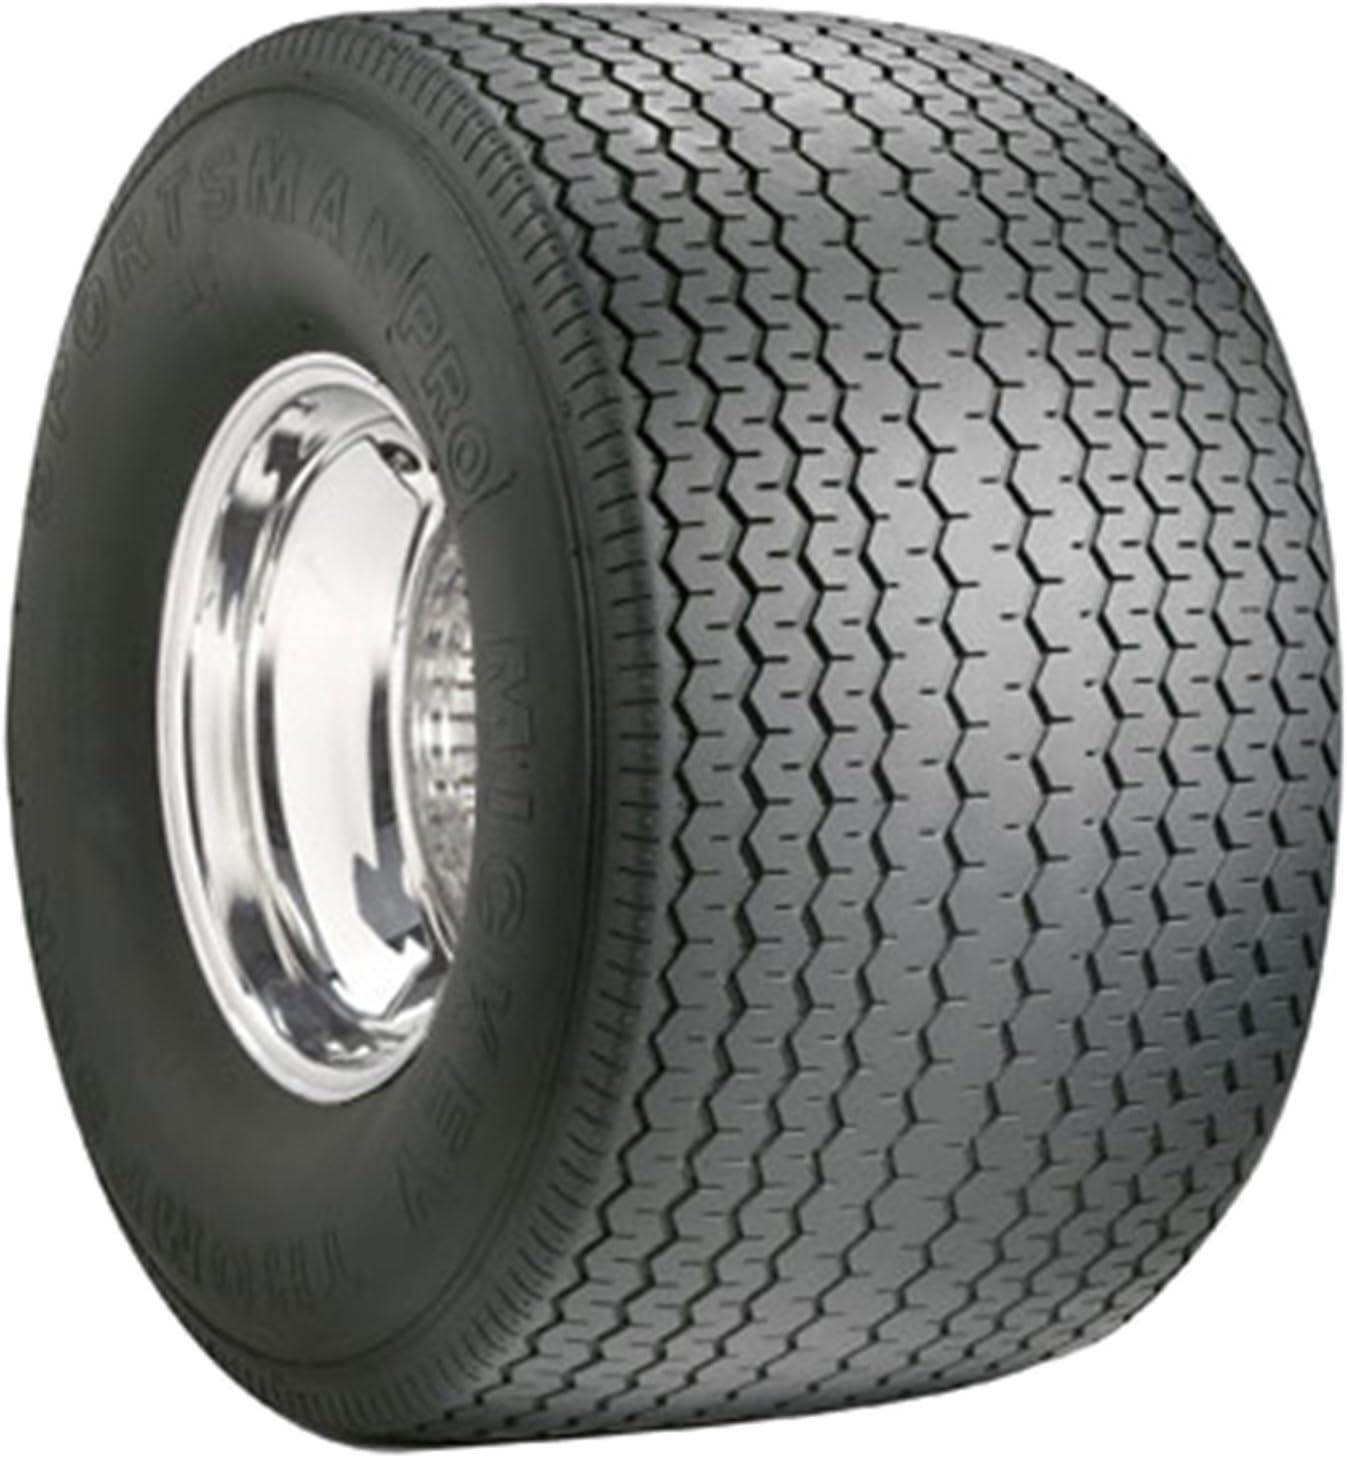 Mickey Thompson Sportsman Pro Performance Bias Tire - 31X18.50-15LT